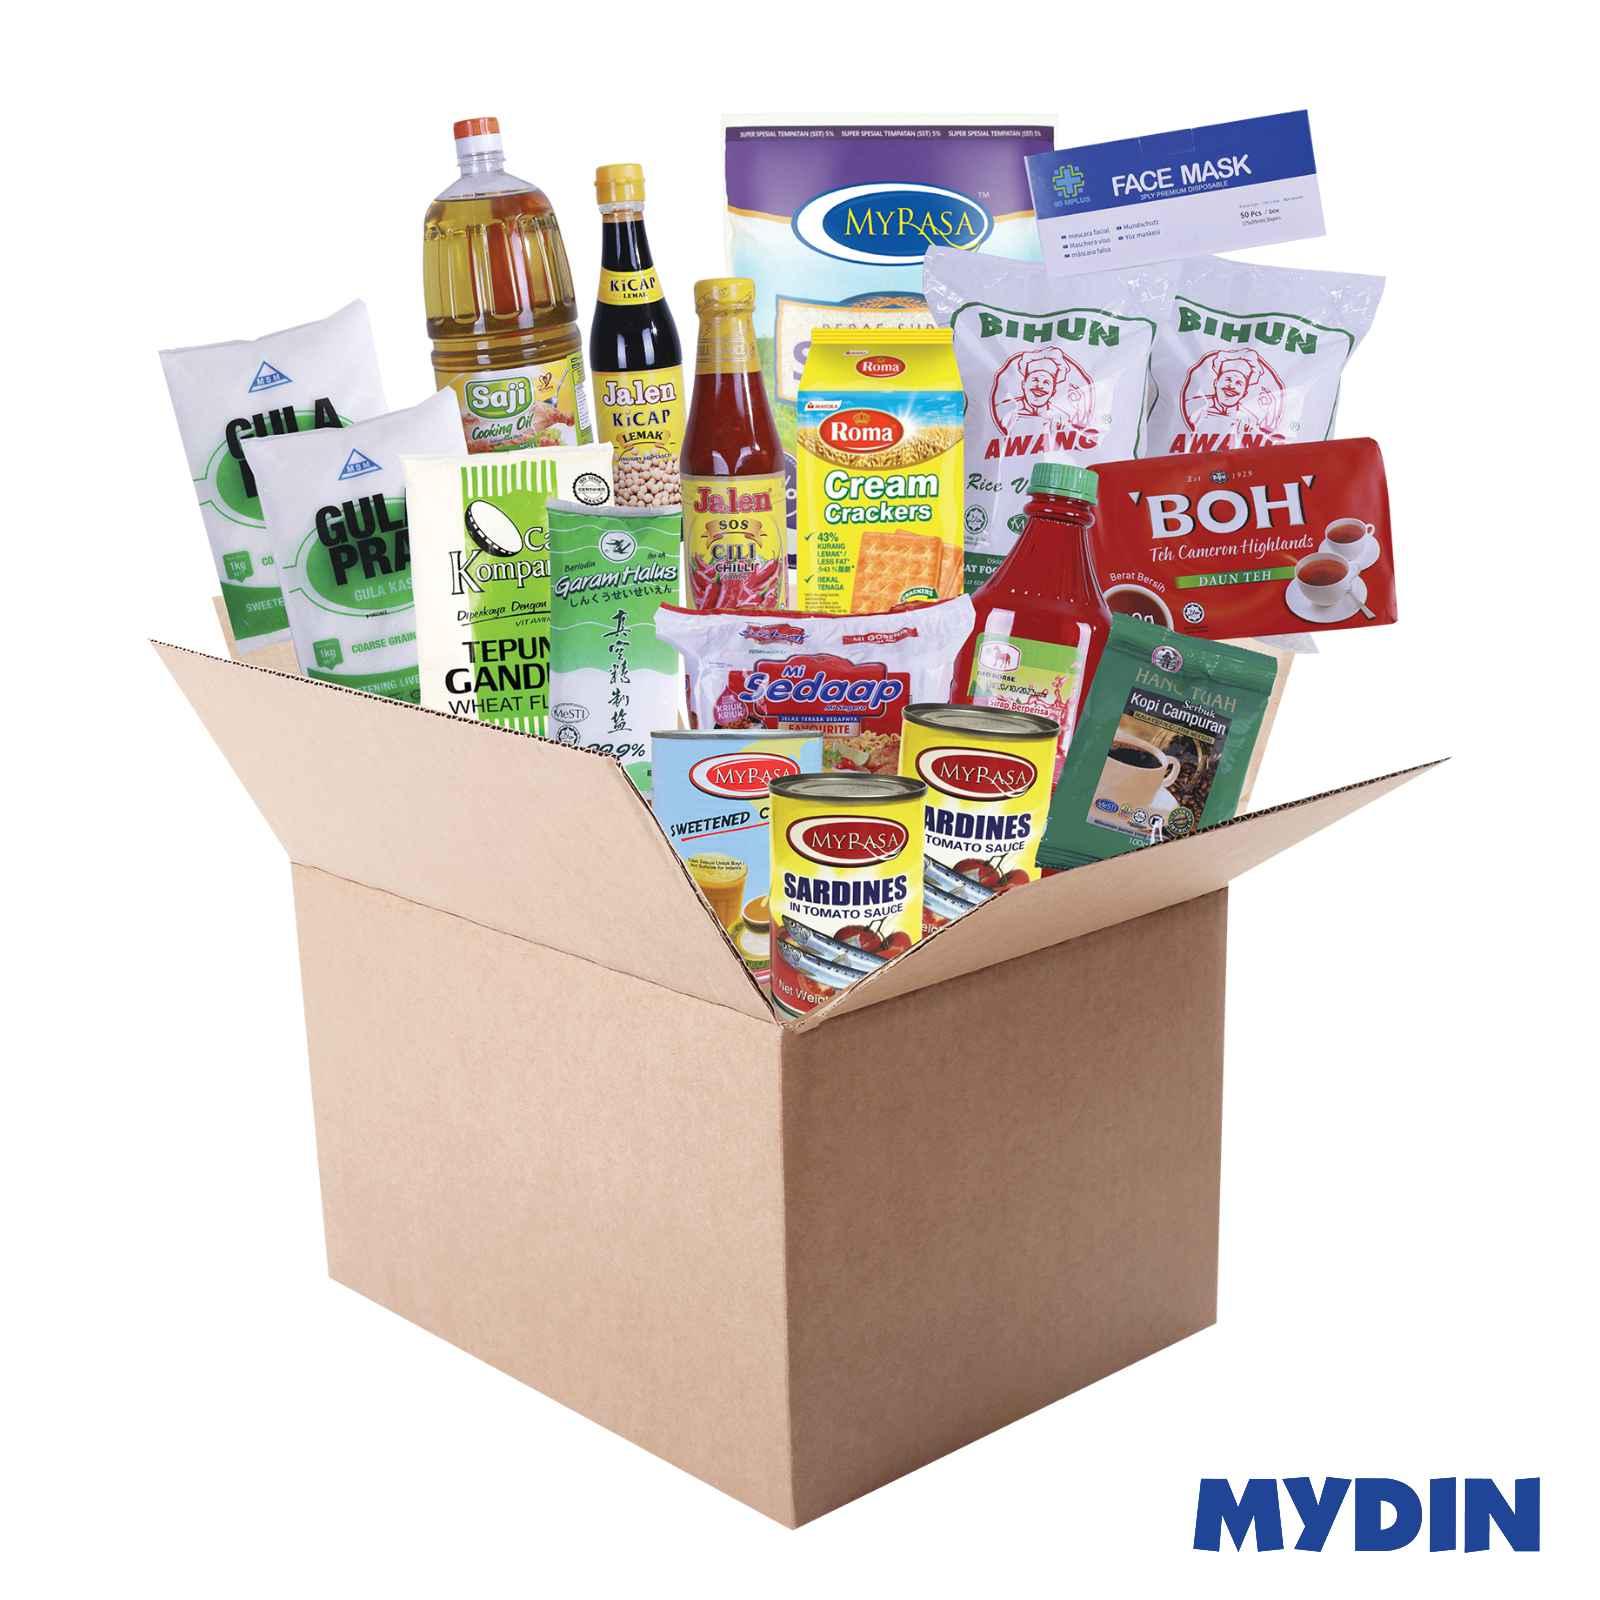 Norma Baharu Box Combo (17 items)